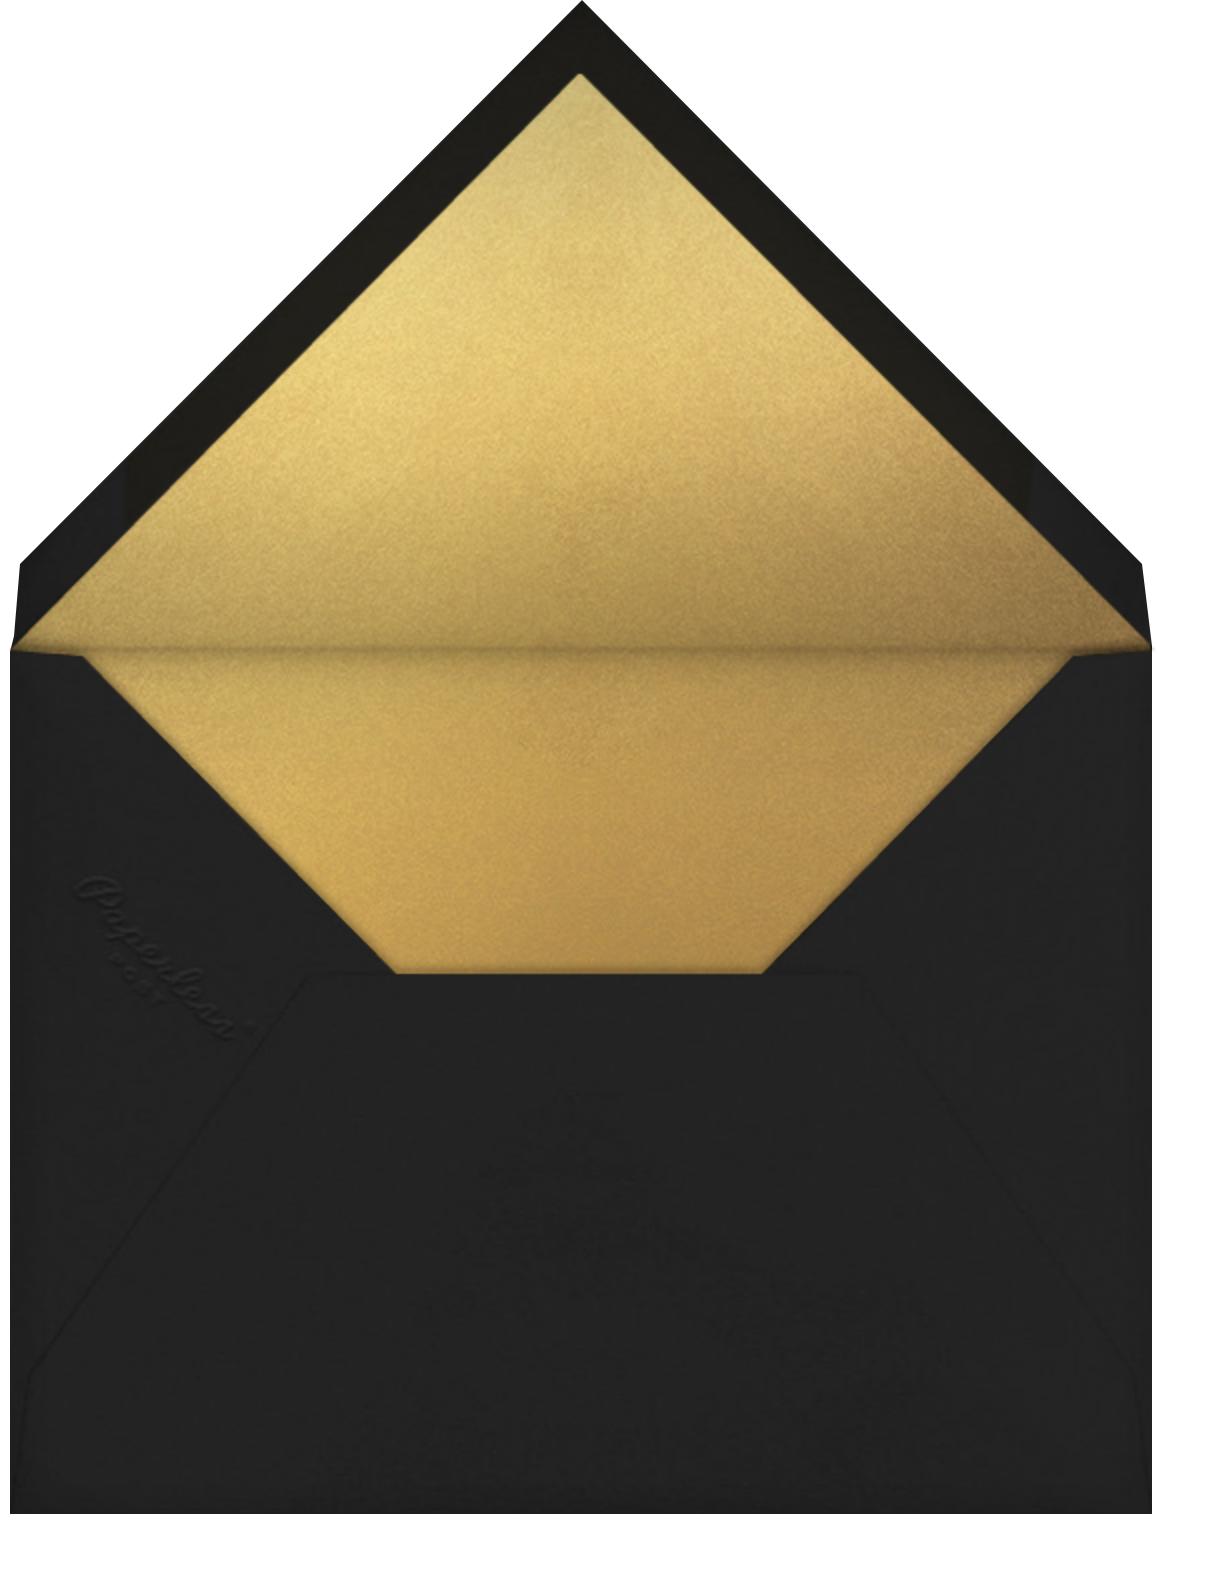 Morgana (Invitation) - Paperless Post - All - envelope back